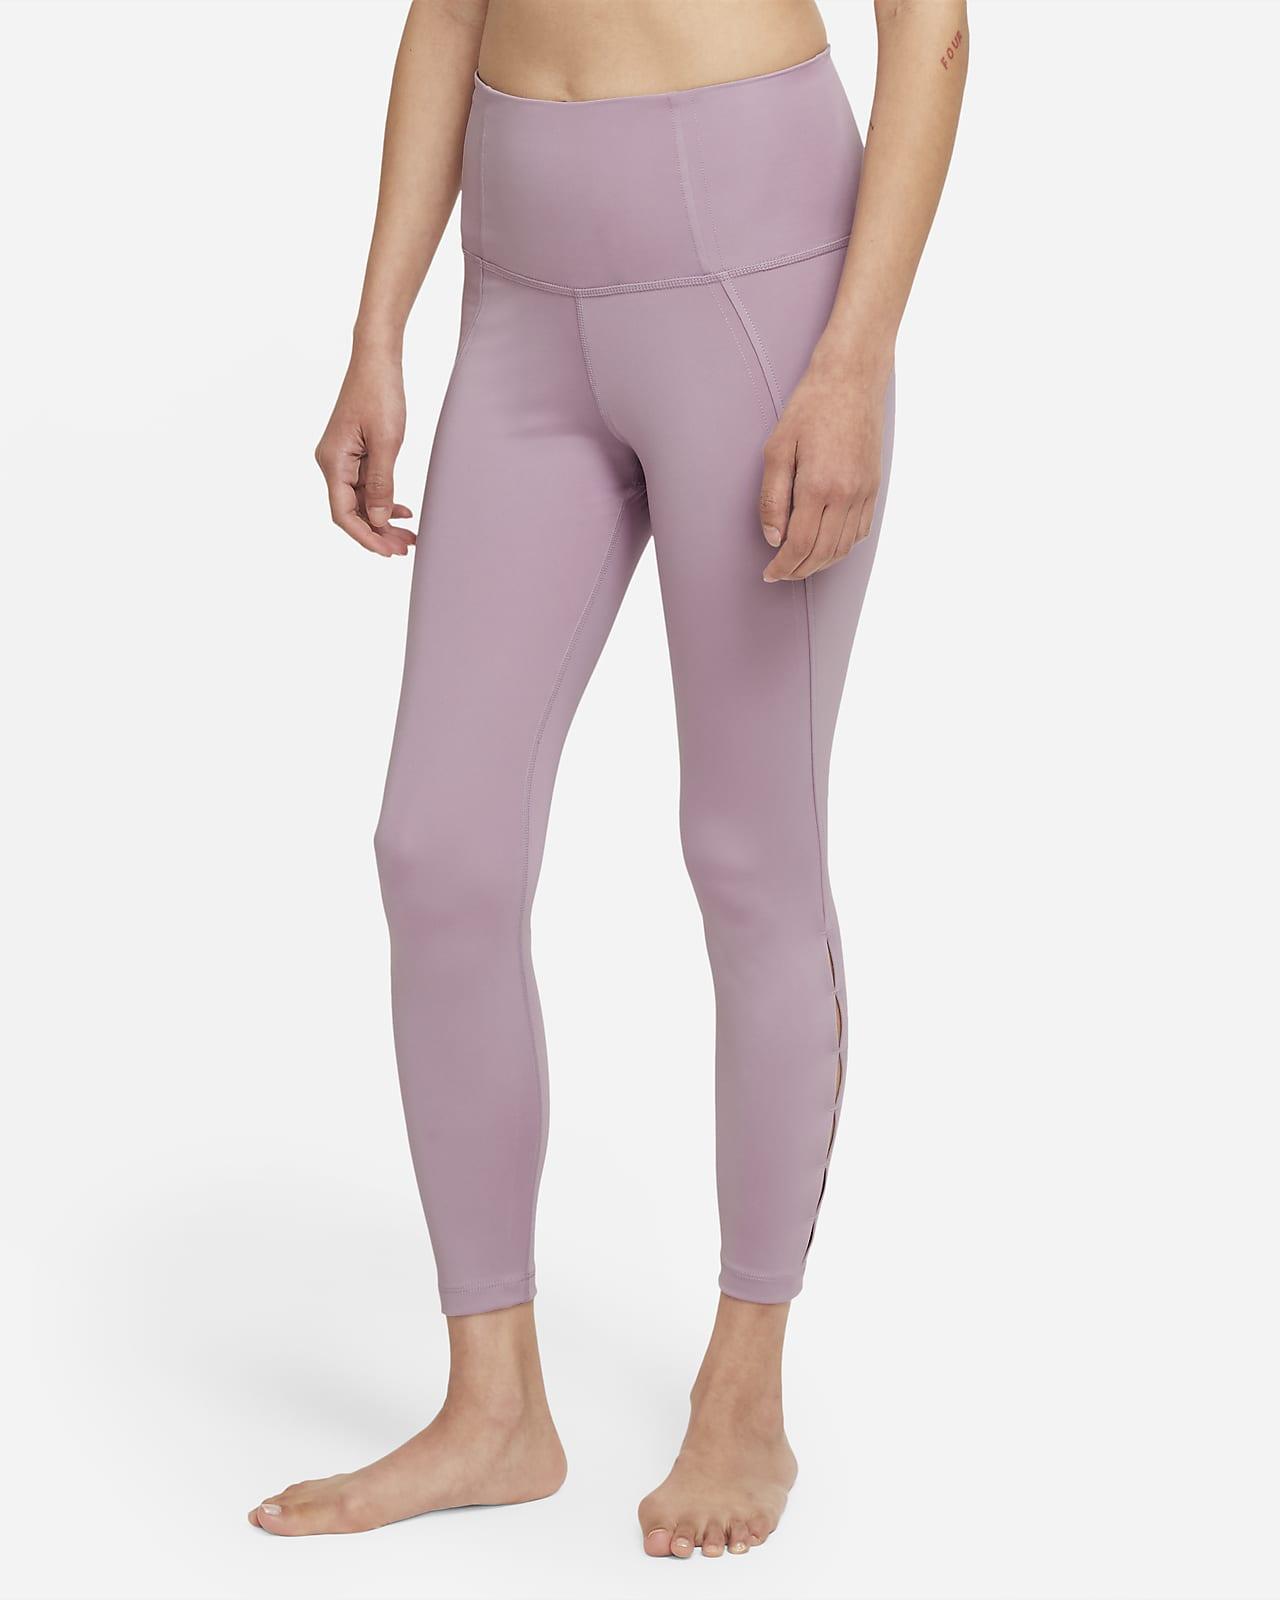 Nike Yoga Dri-FIT 女款高腰鏤空九分內搭褲